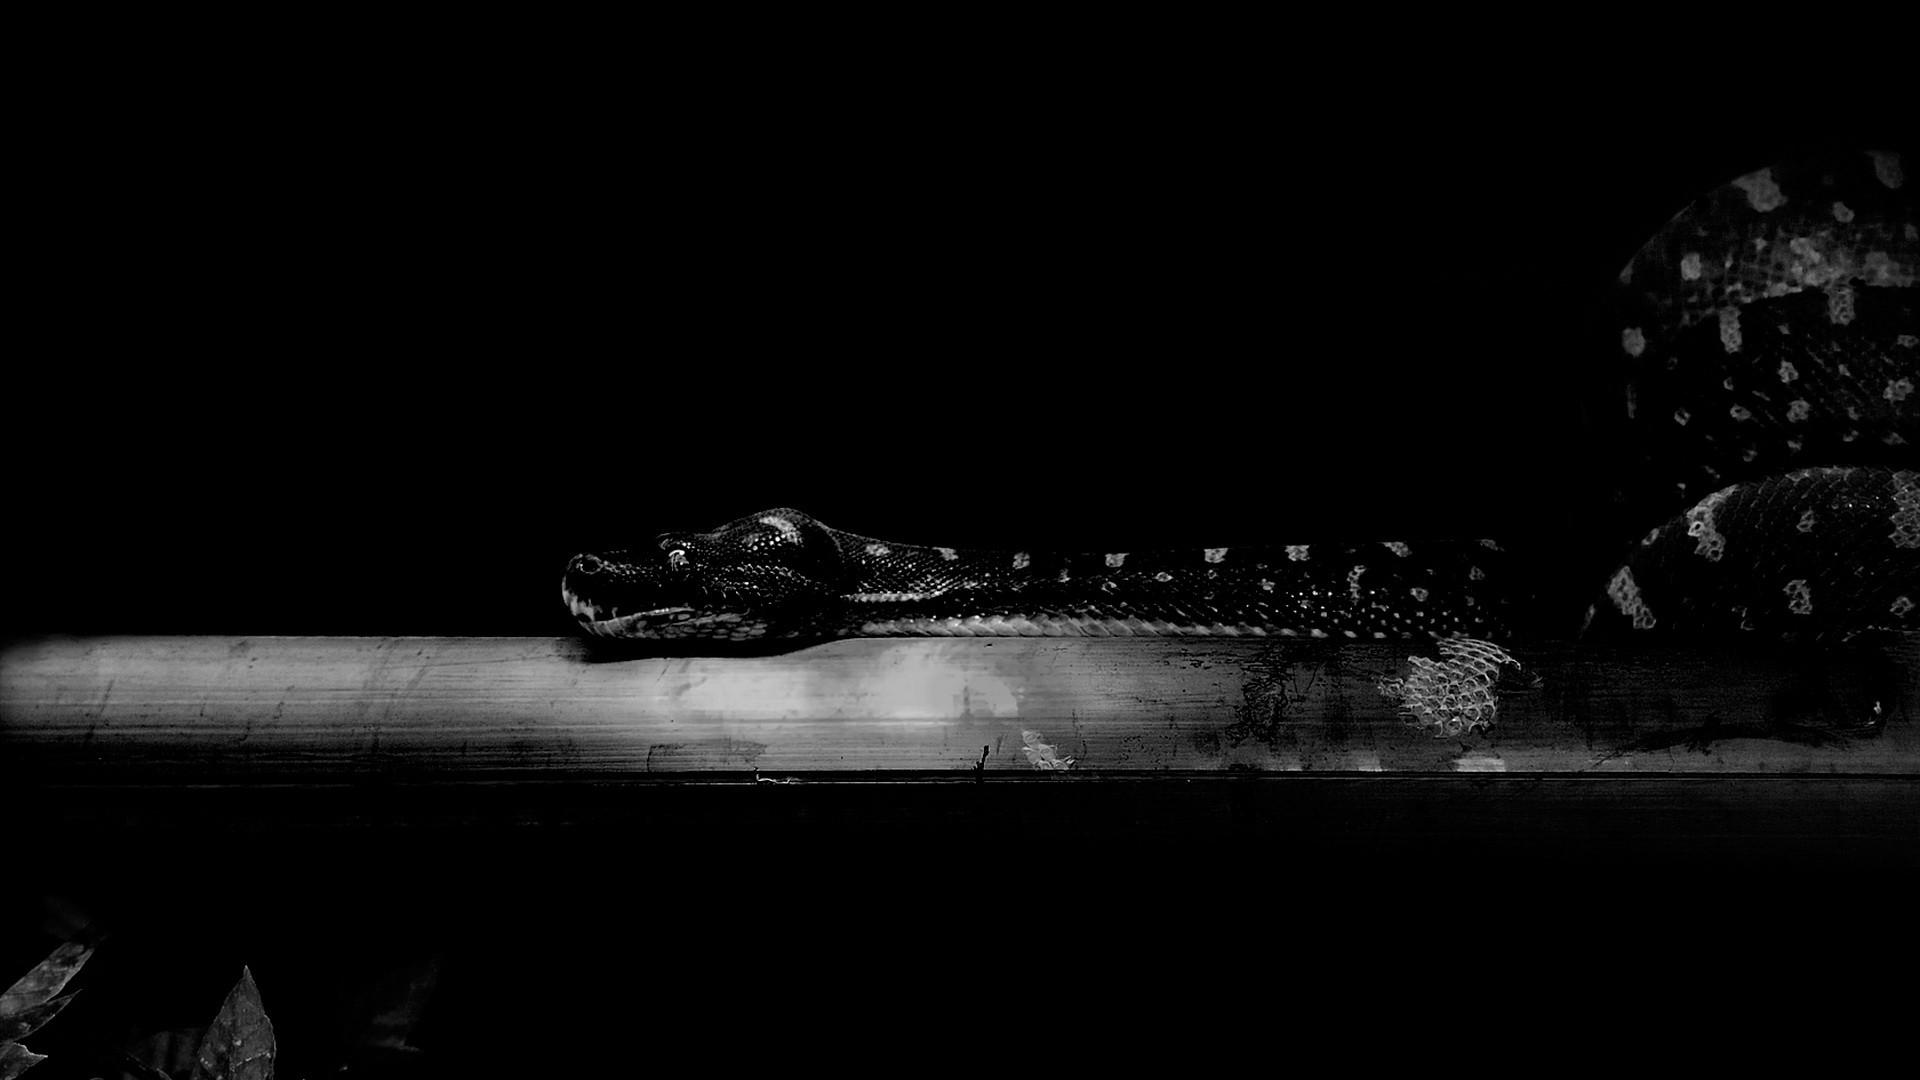 Leaves white black animals monochrome black background dark night nature photography wood snake light lighting darkness